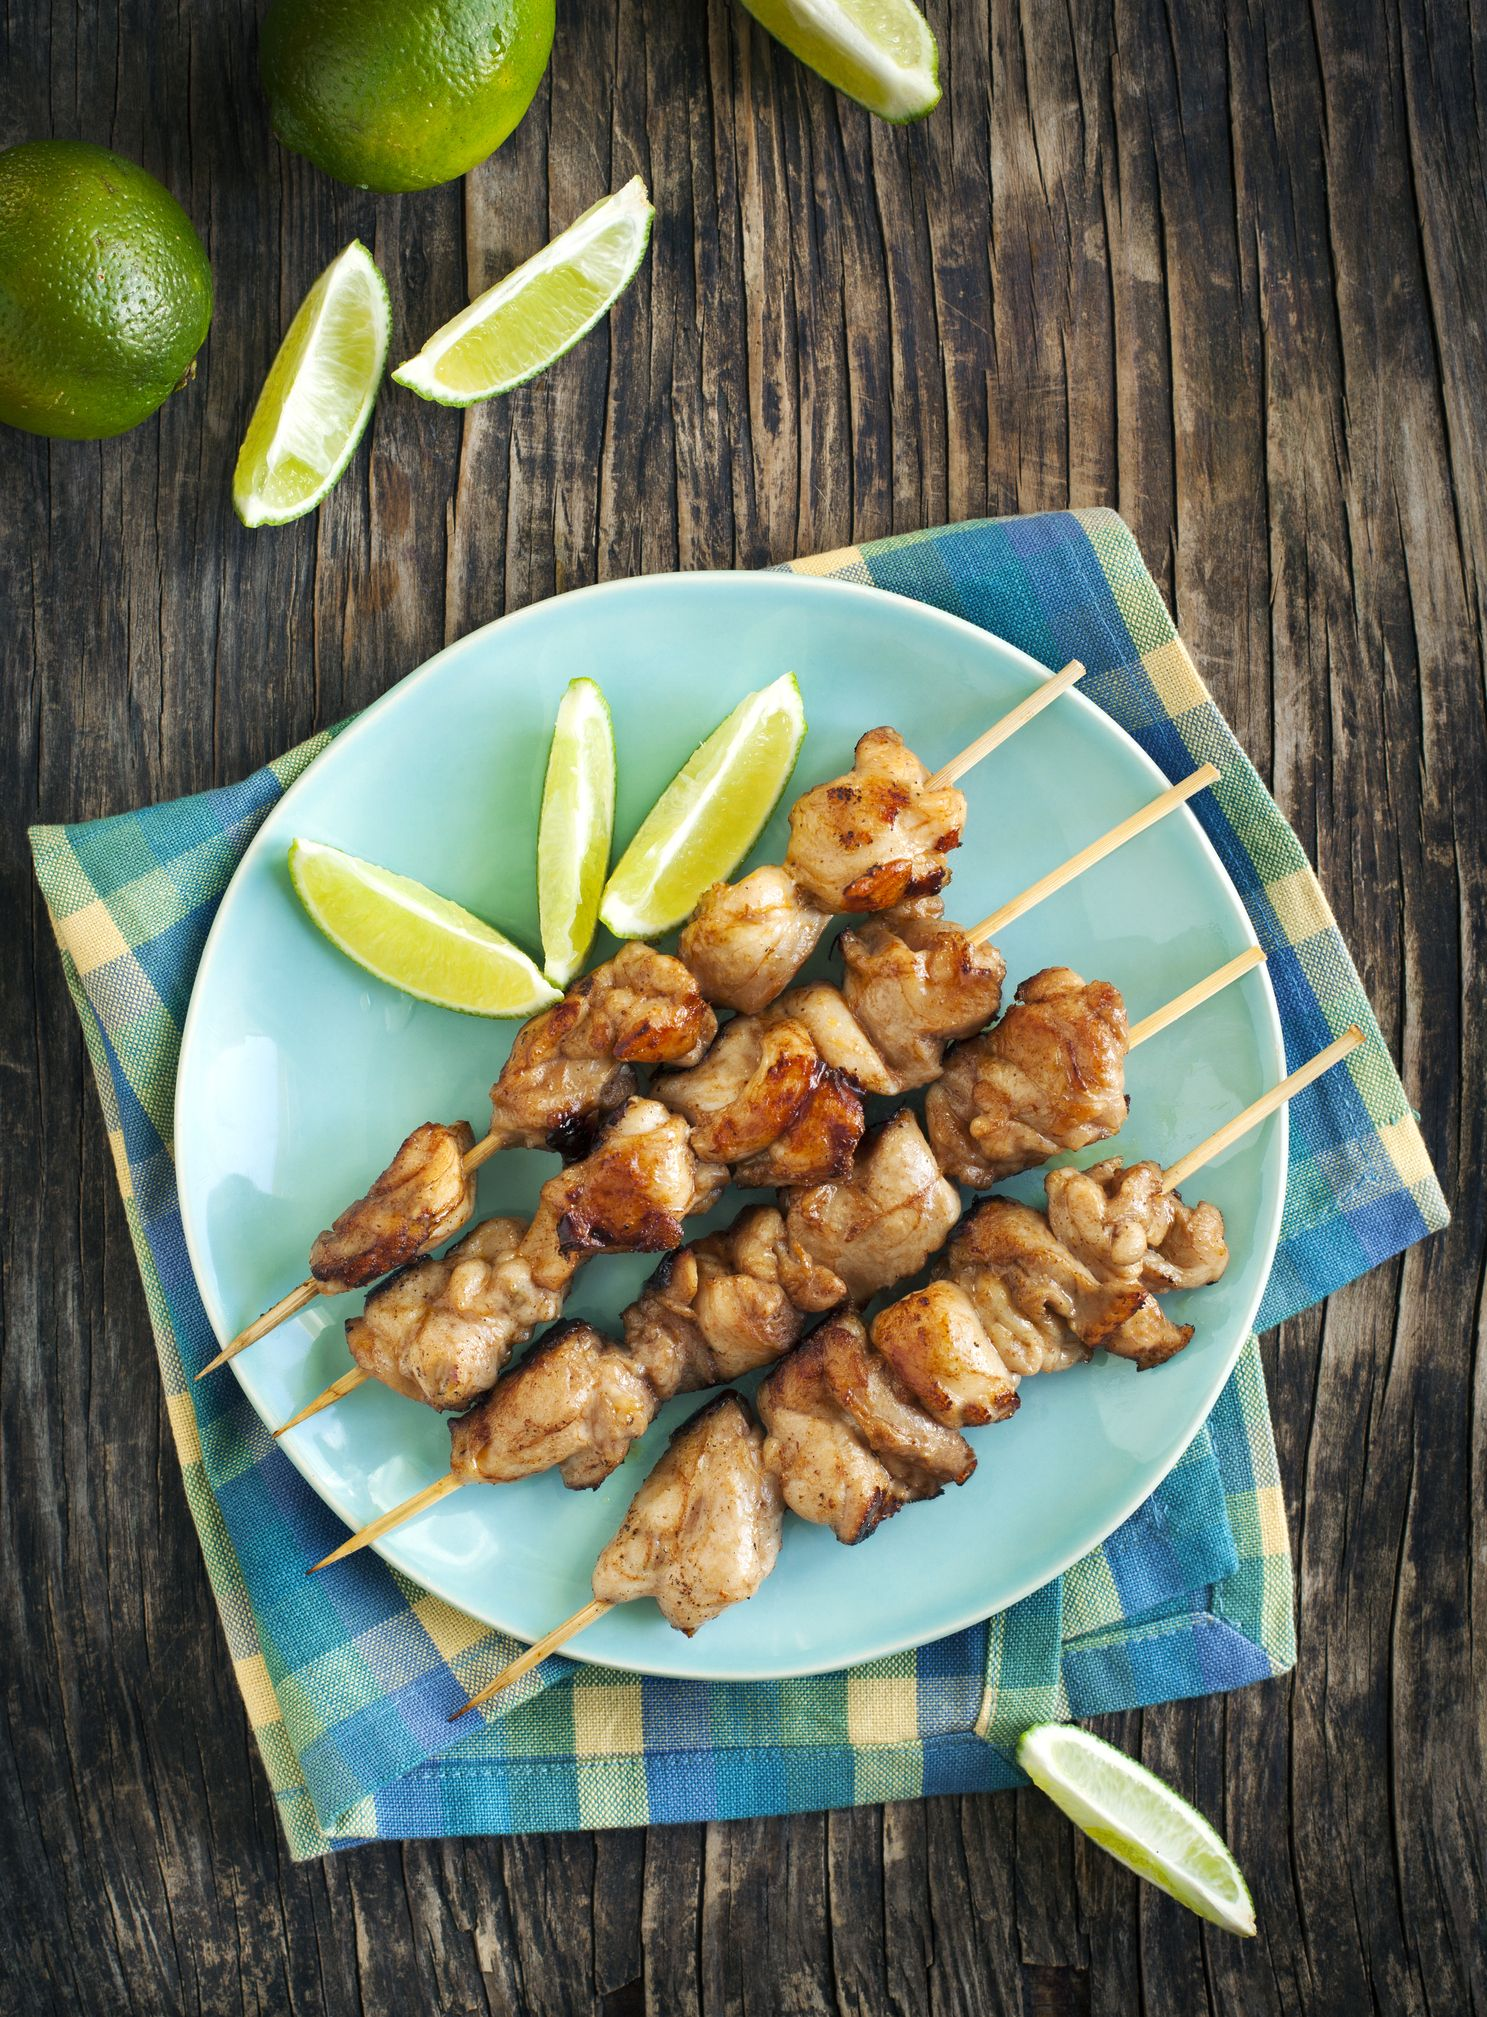 Mahogany chicken skewers